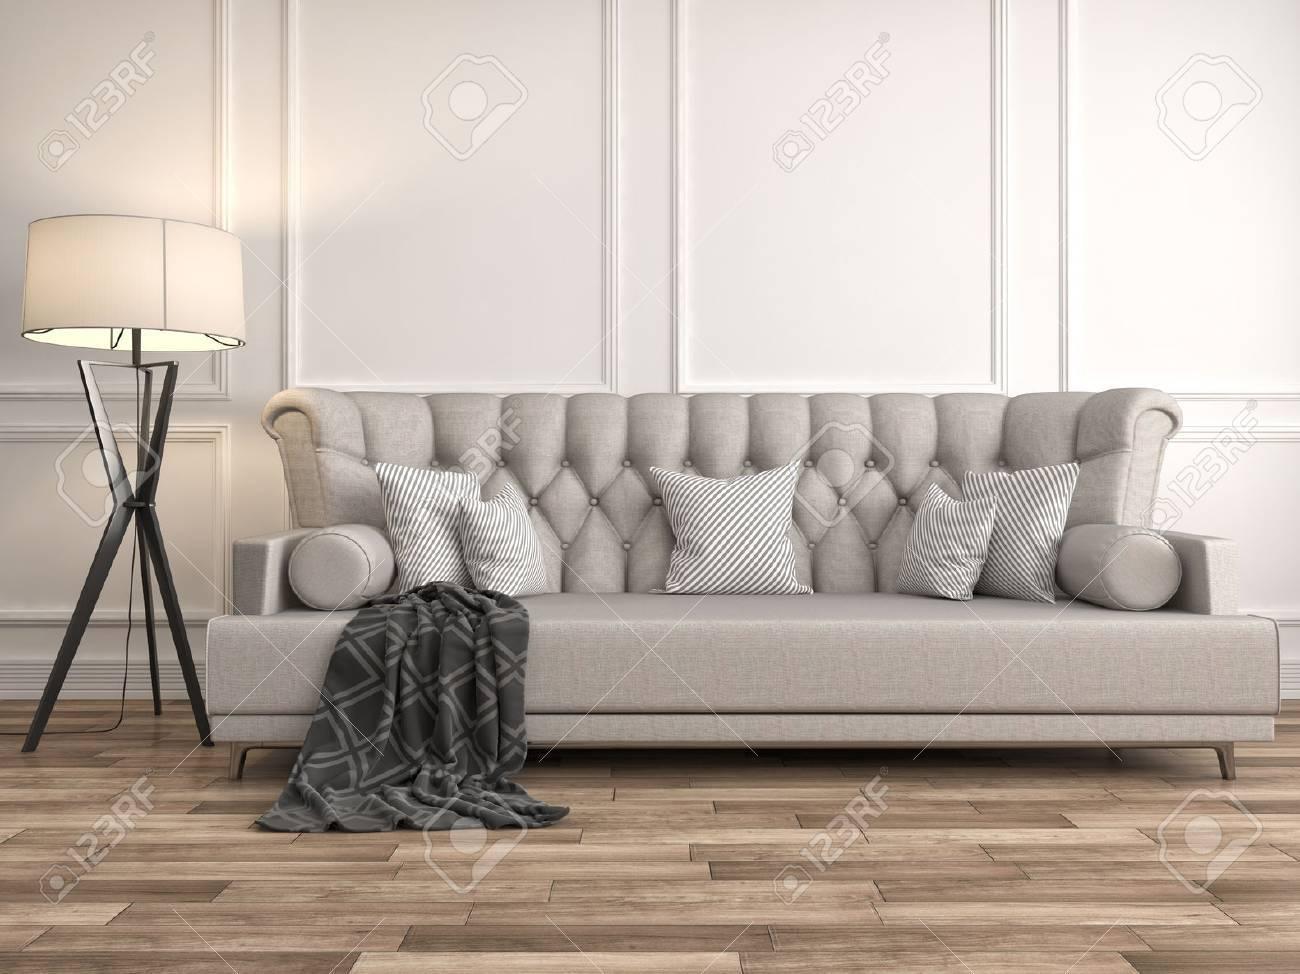 interior with sofa. 3d illustration - 54854535